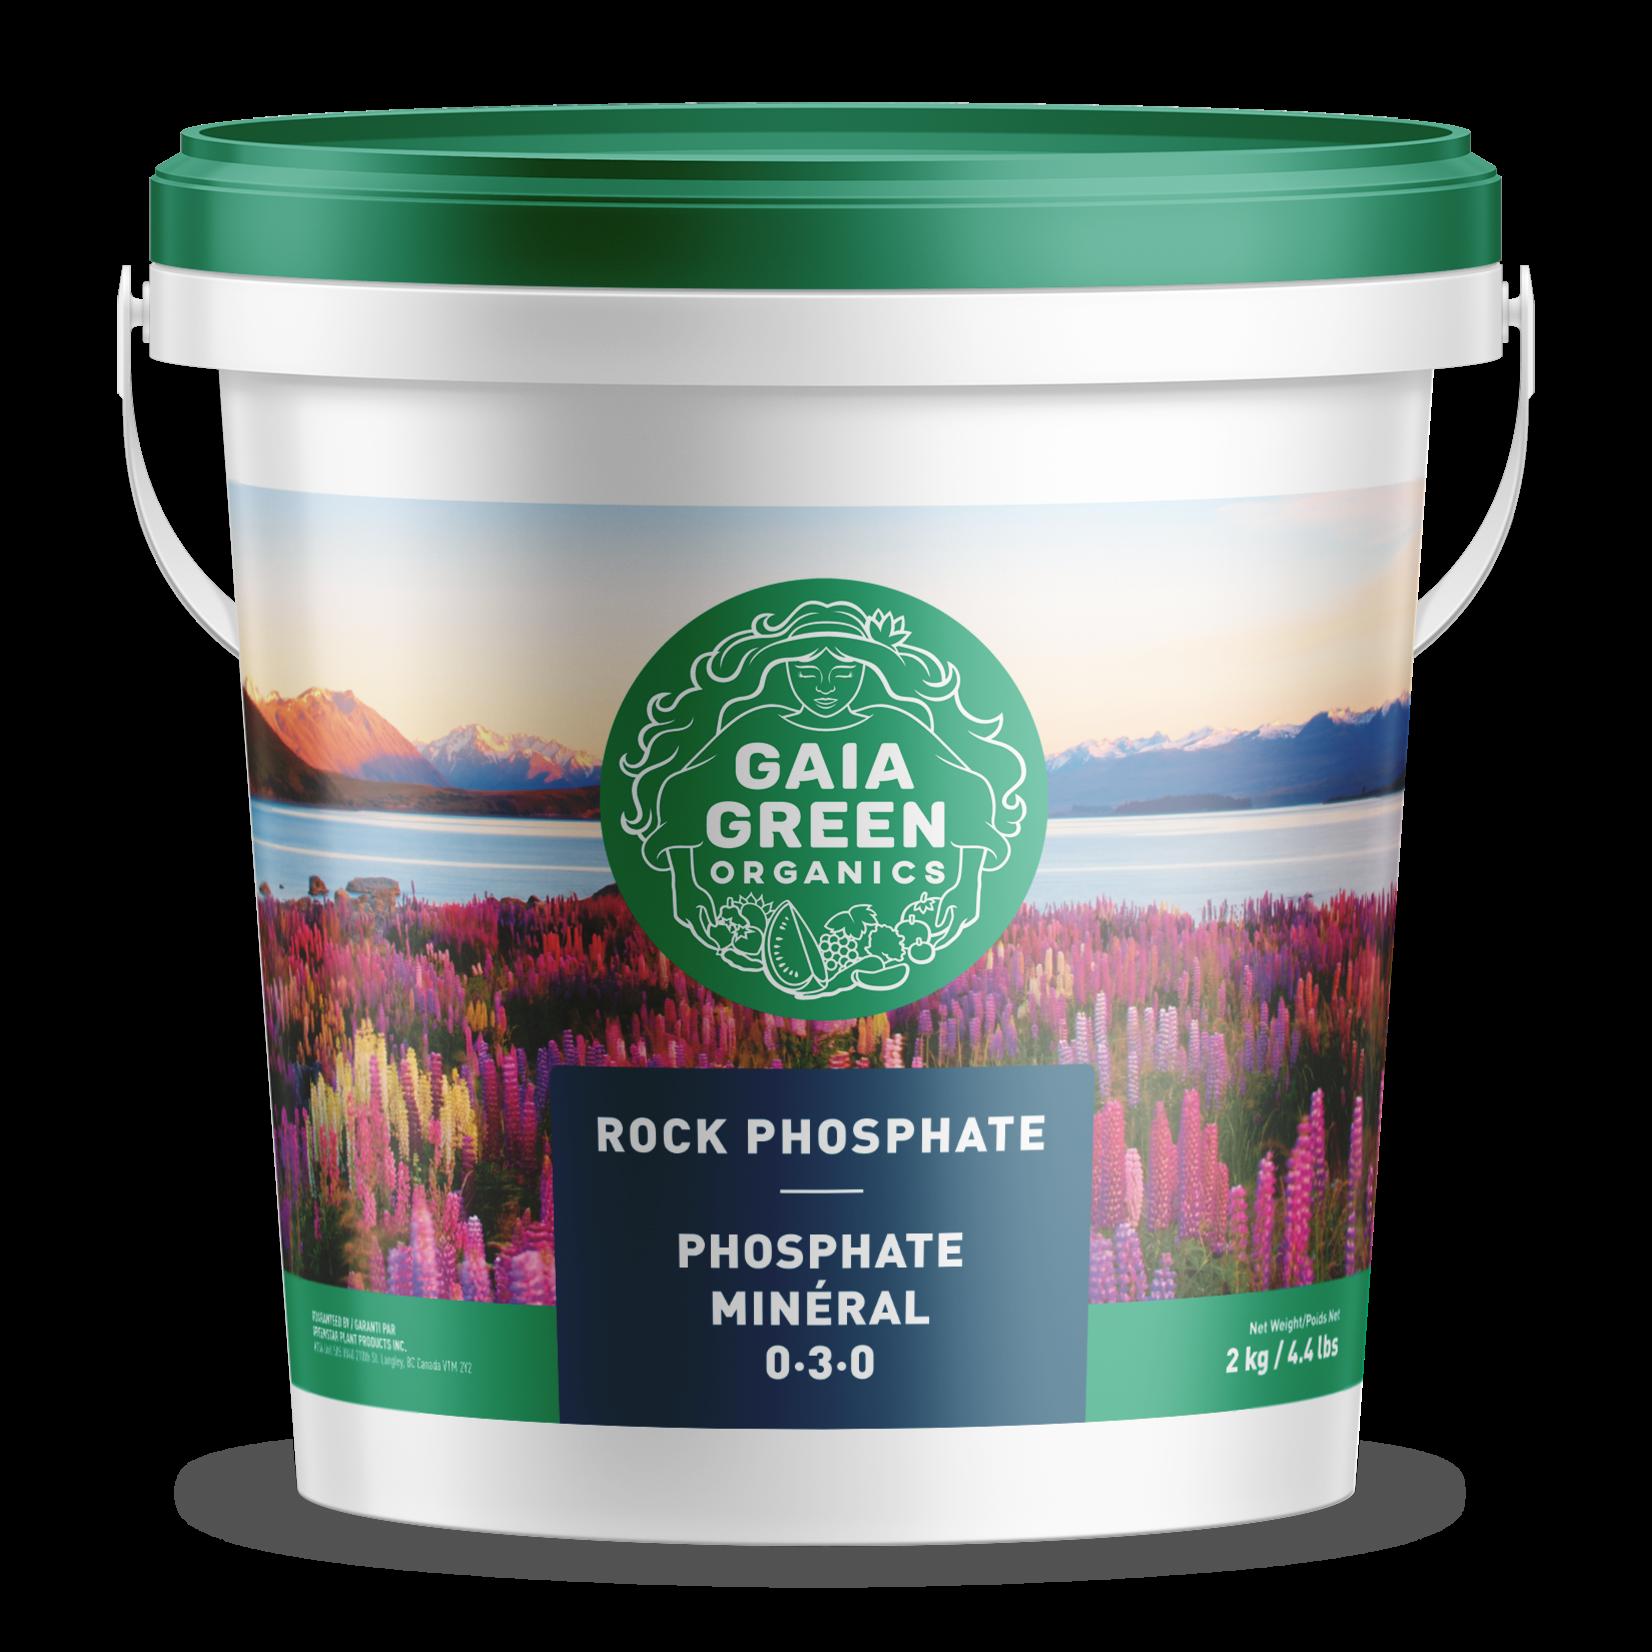 gaia green Gaia Green ROCK PHOSPHATE 2KG